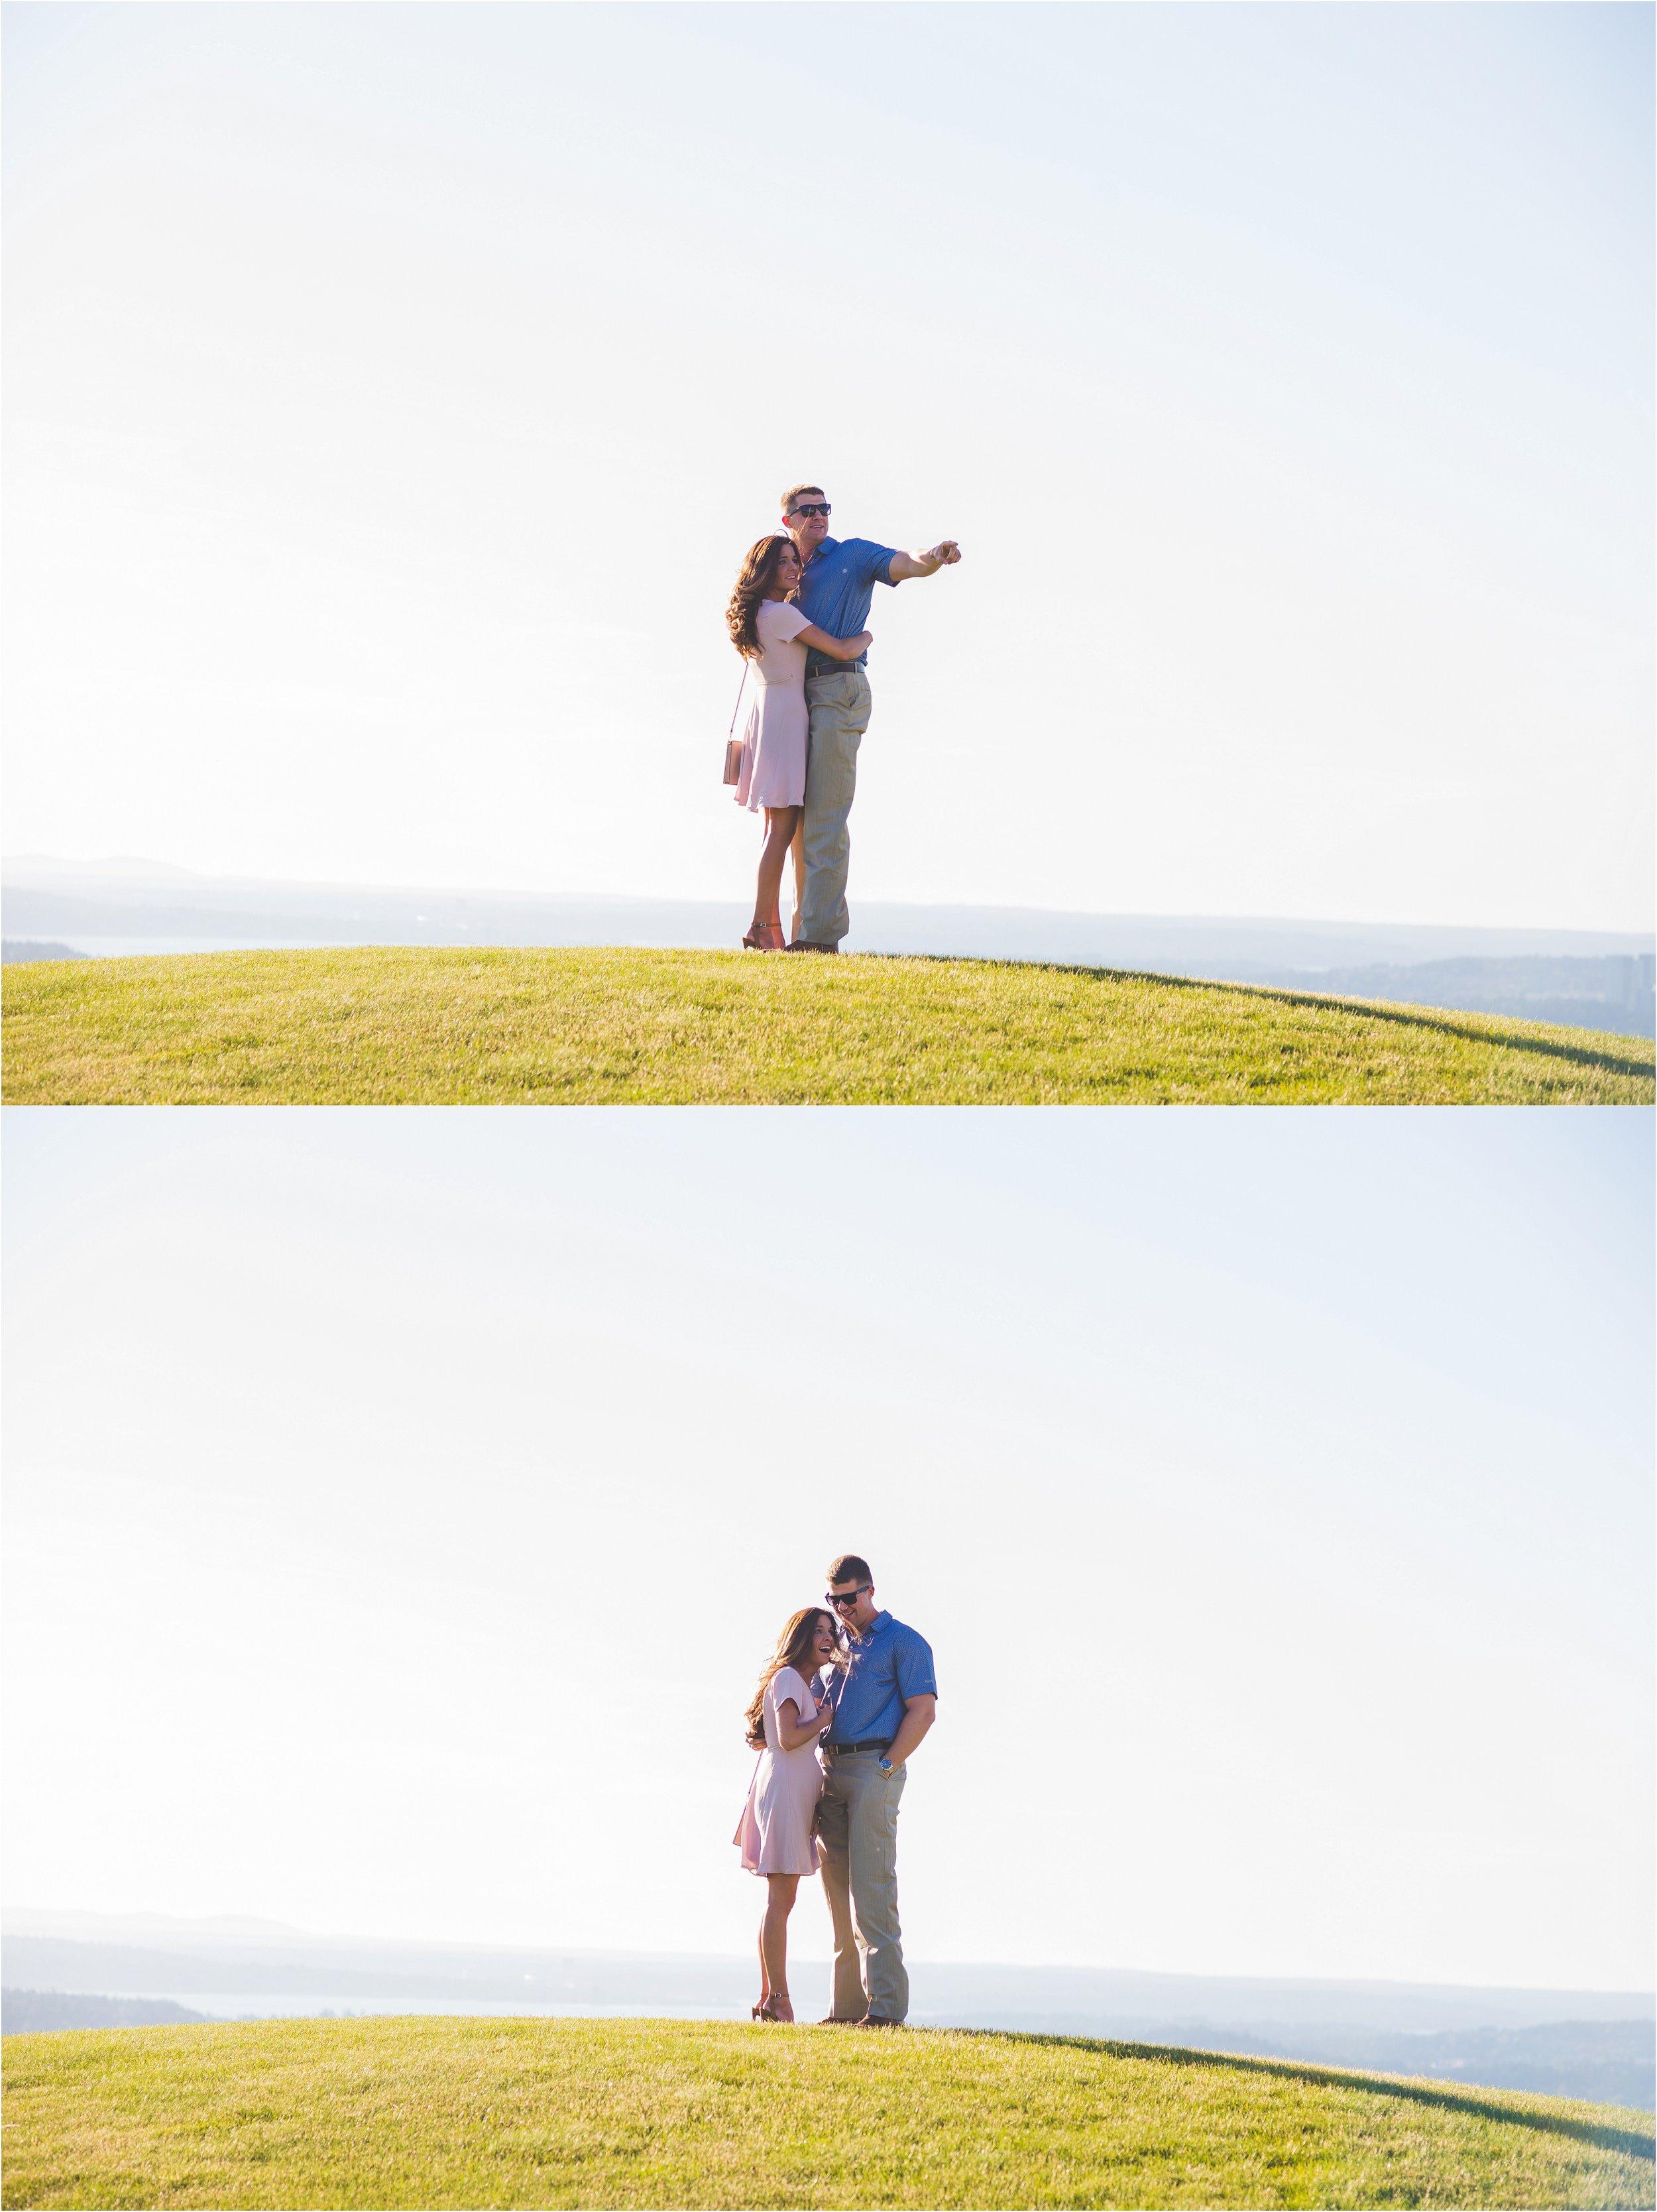 newcastle-golf-club-proposal-jannicka-mayte-seattle-washington-engagement-wedding-photographer_0007.jpg